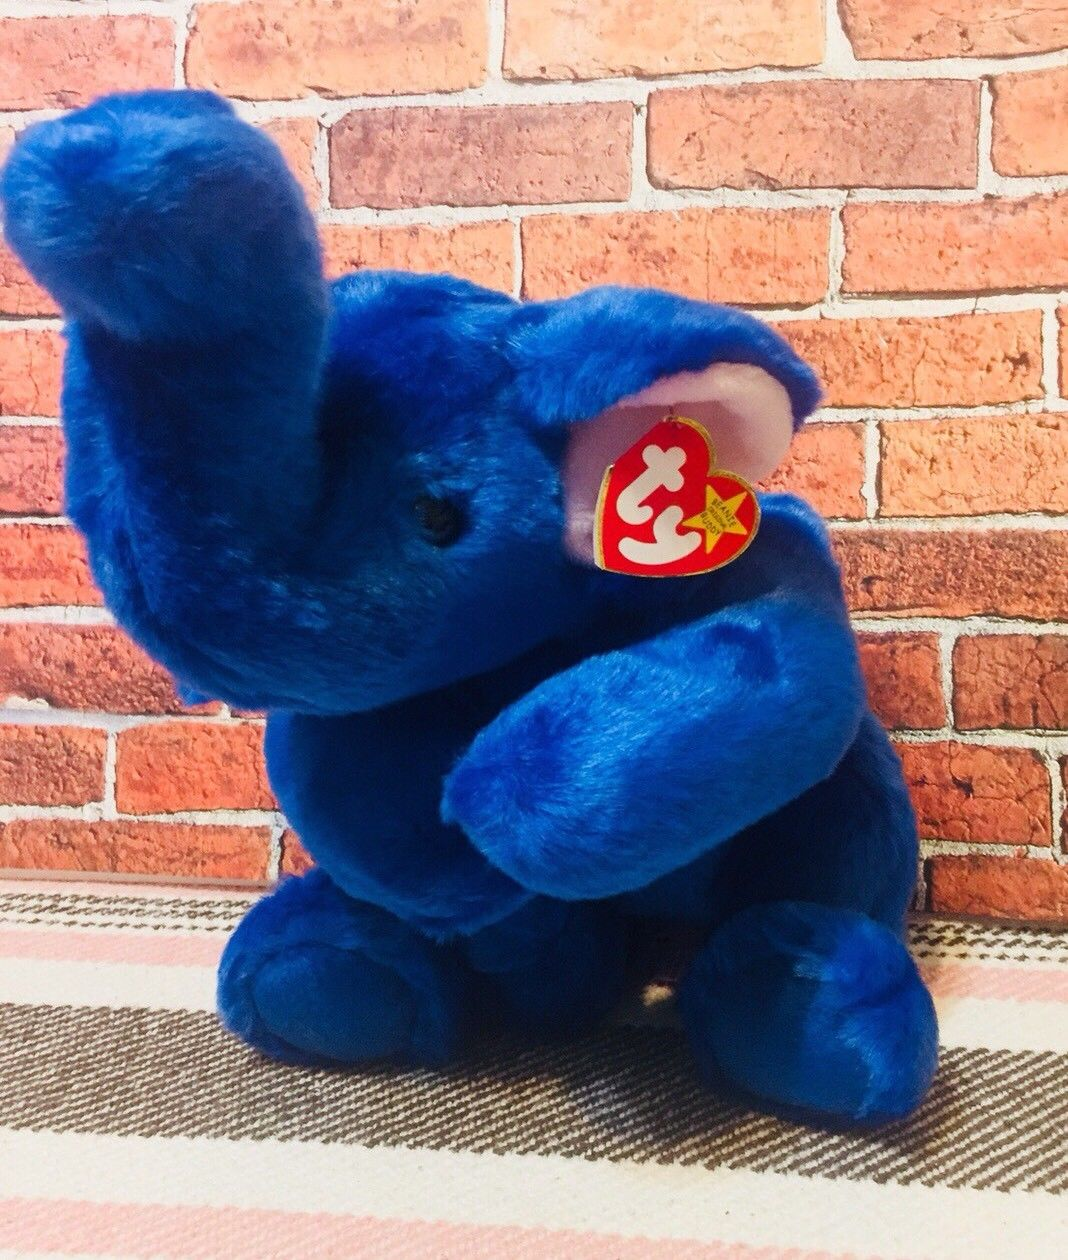 Peanut The Royal Blue Elephant Beanie Baby